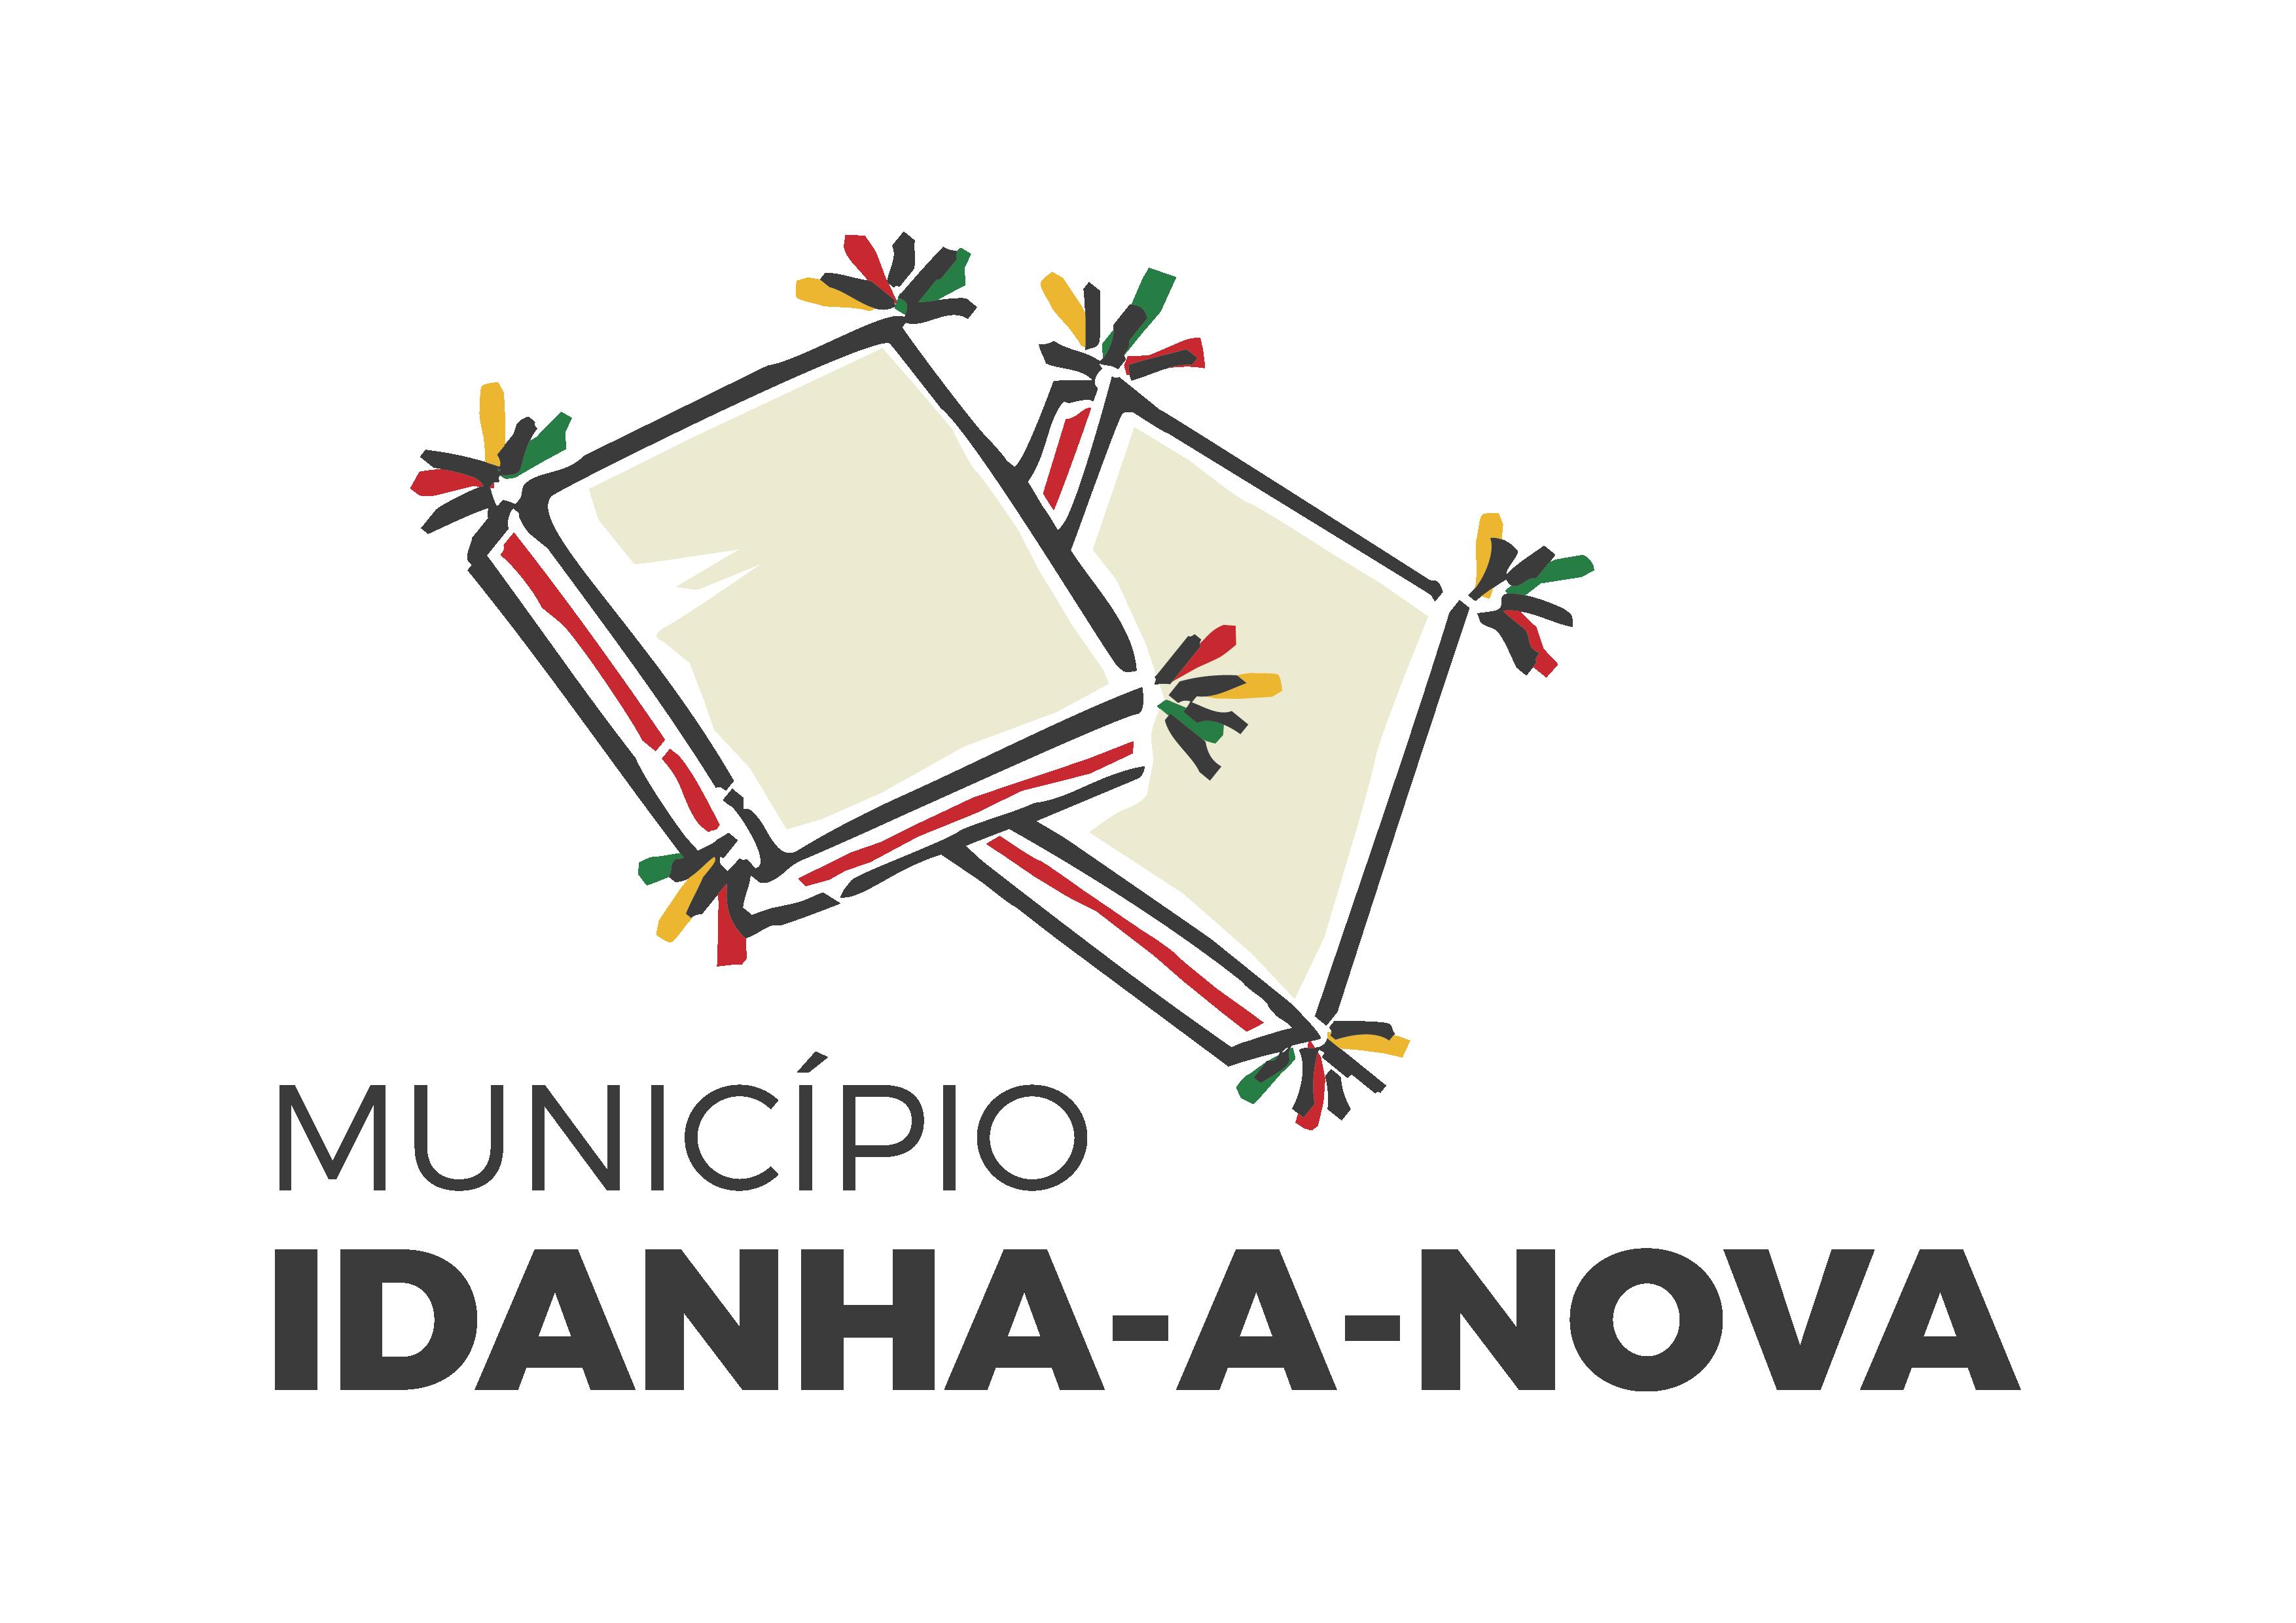 Idanha-a-Nova Municipality